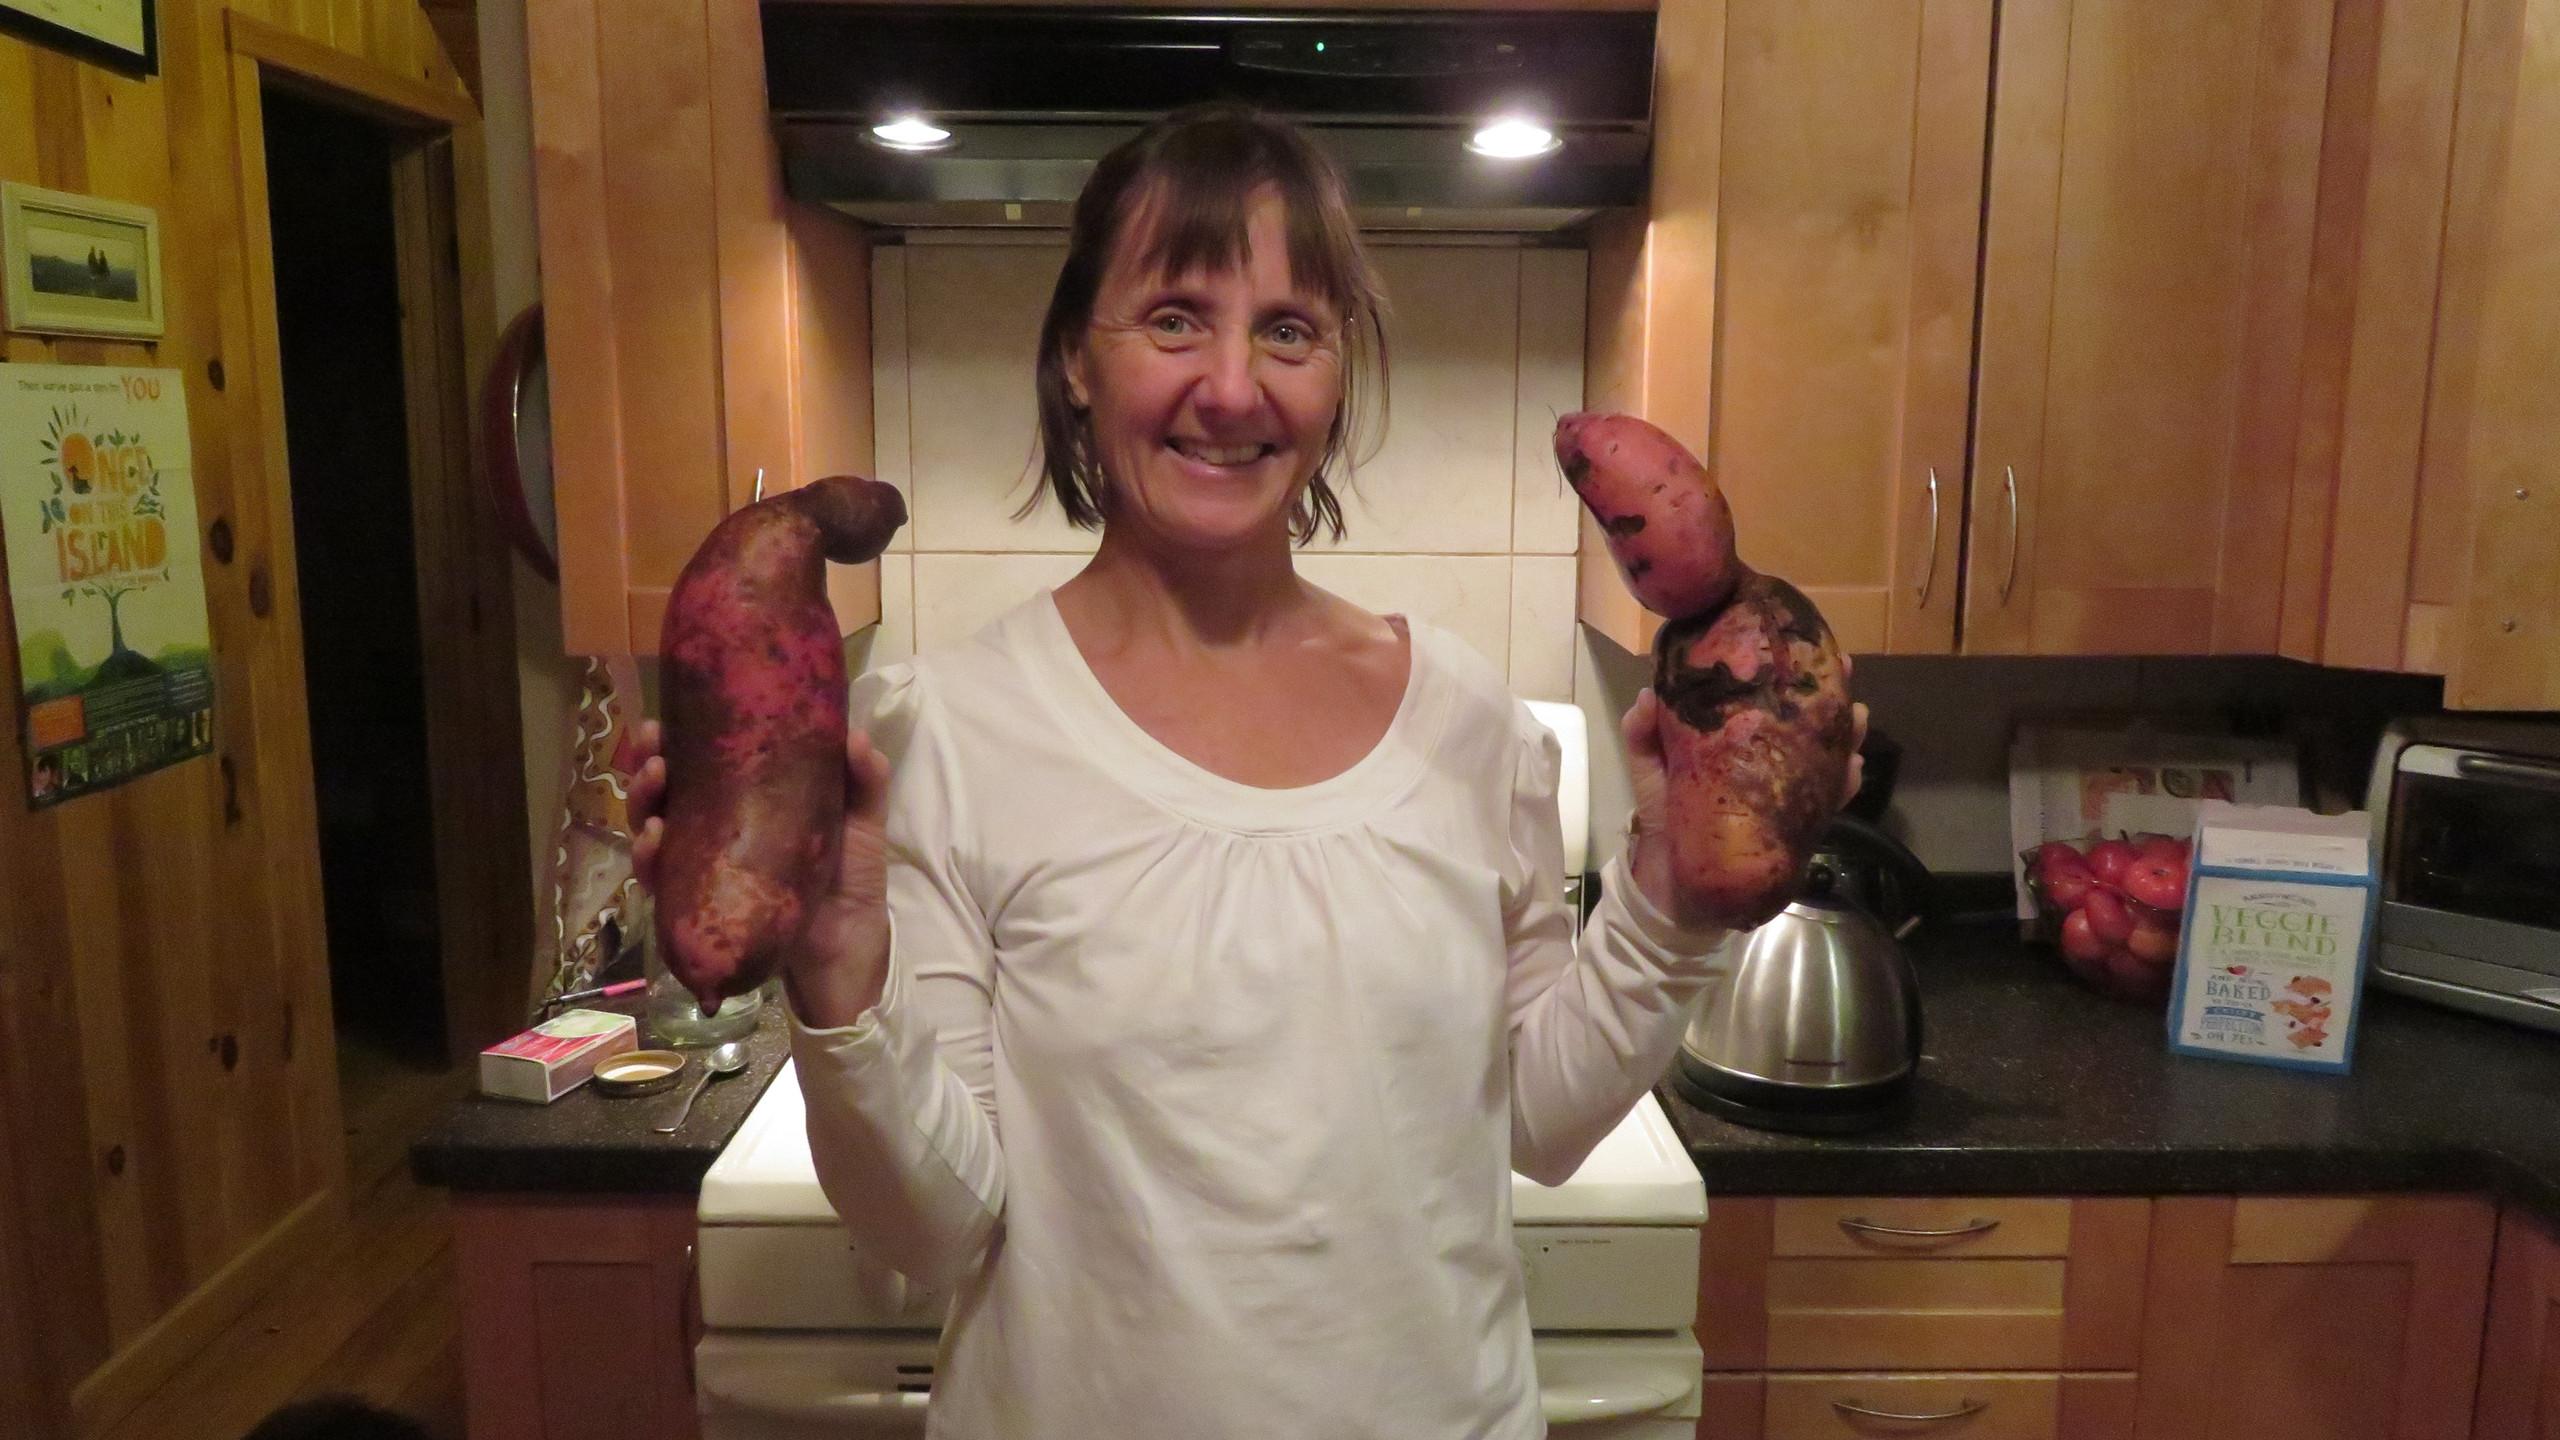 Huge Sweet potatoes